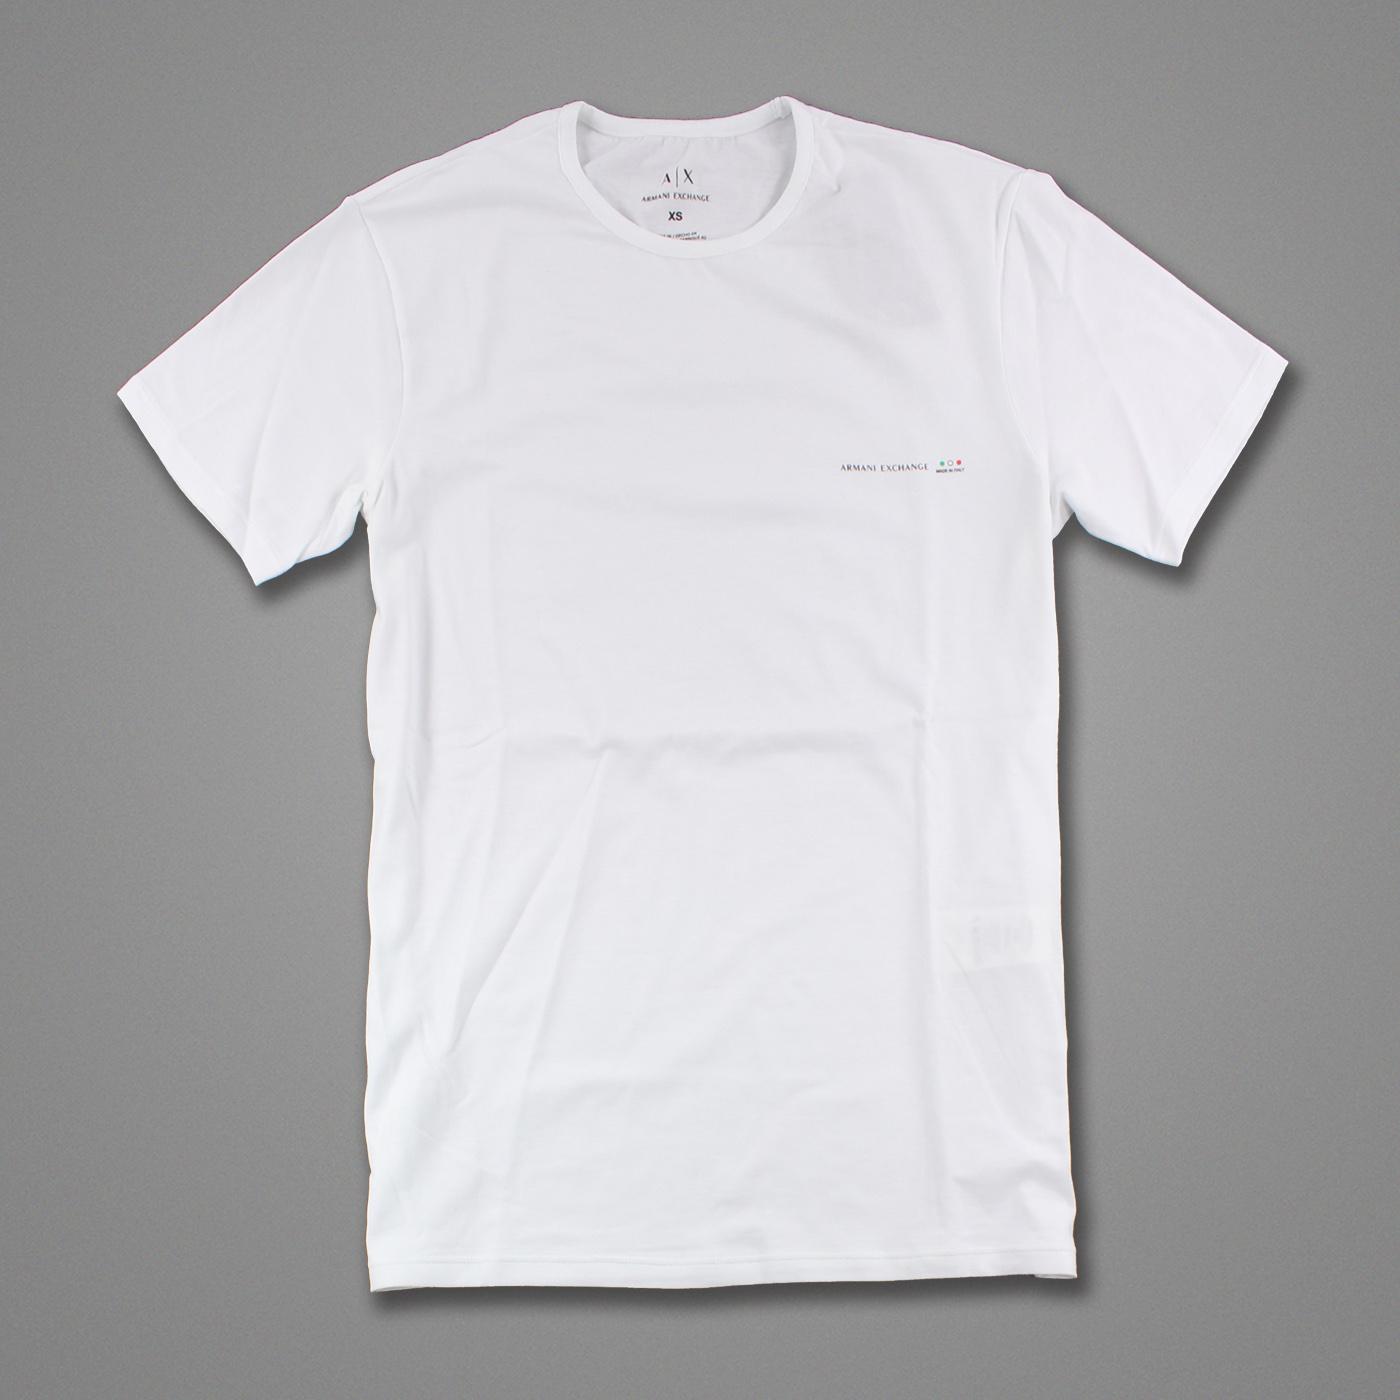 美國百分百【Armani Exchange】T恤 AX 短袖 logo 上衣 T-shirt 白色 XS S號 G049